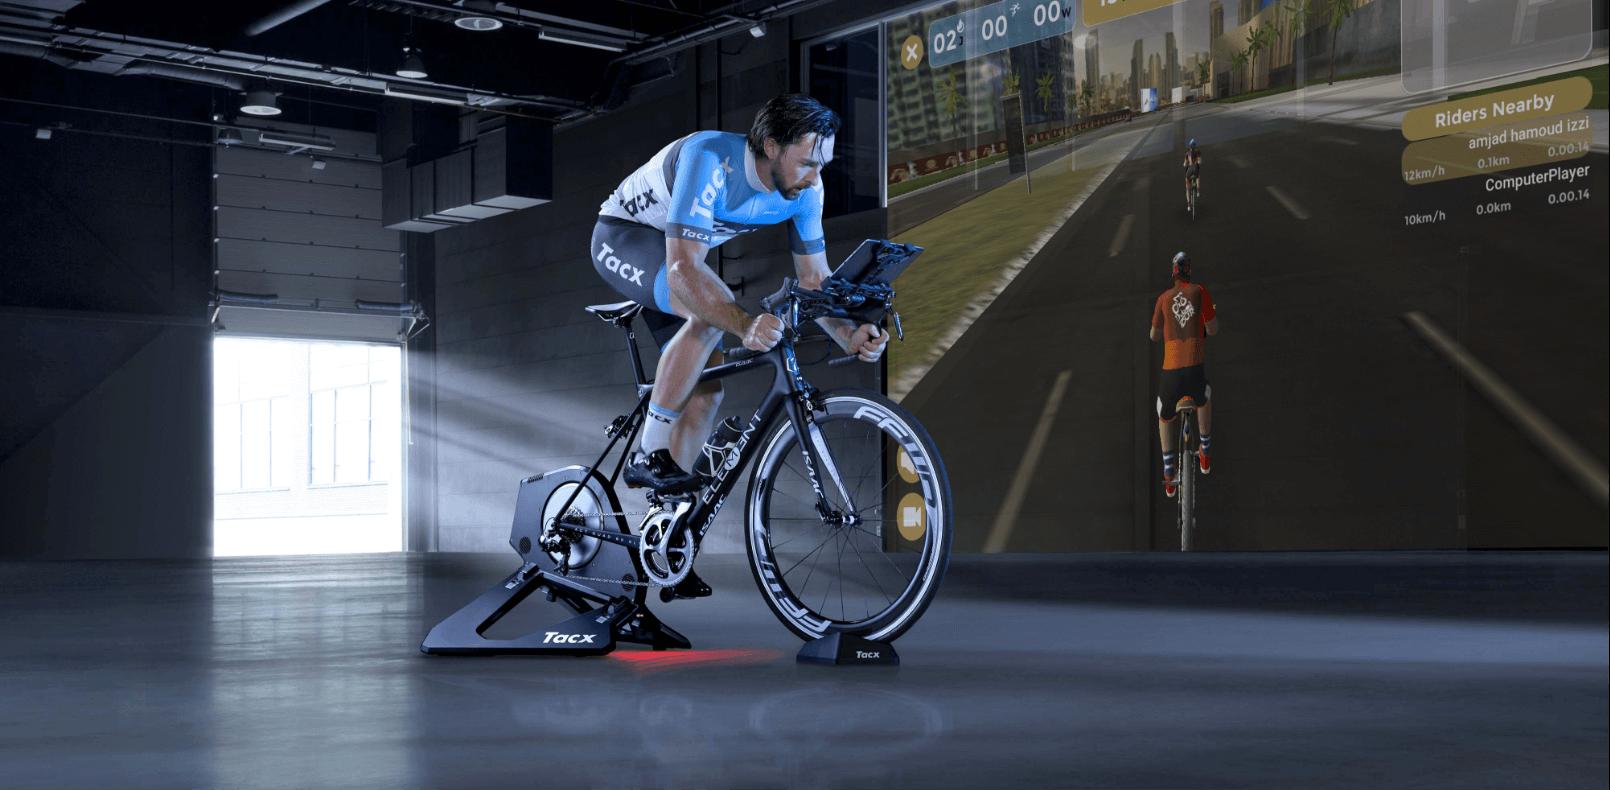 dubai-cycling-app